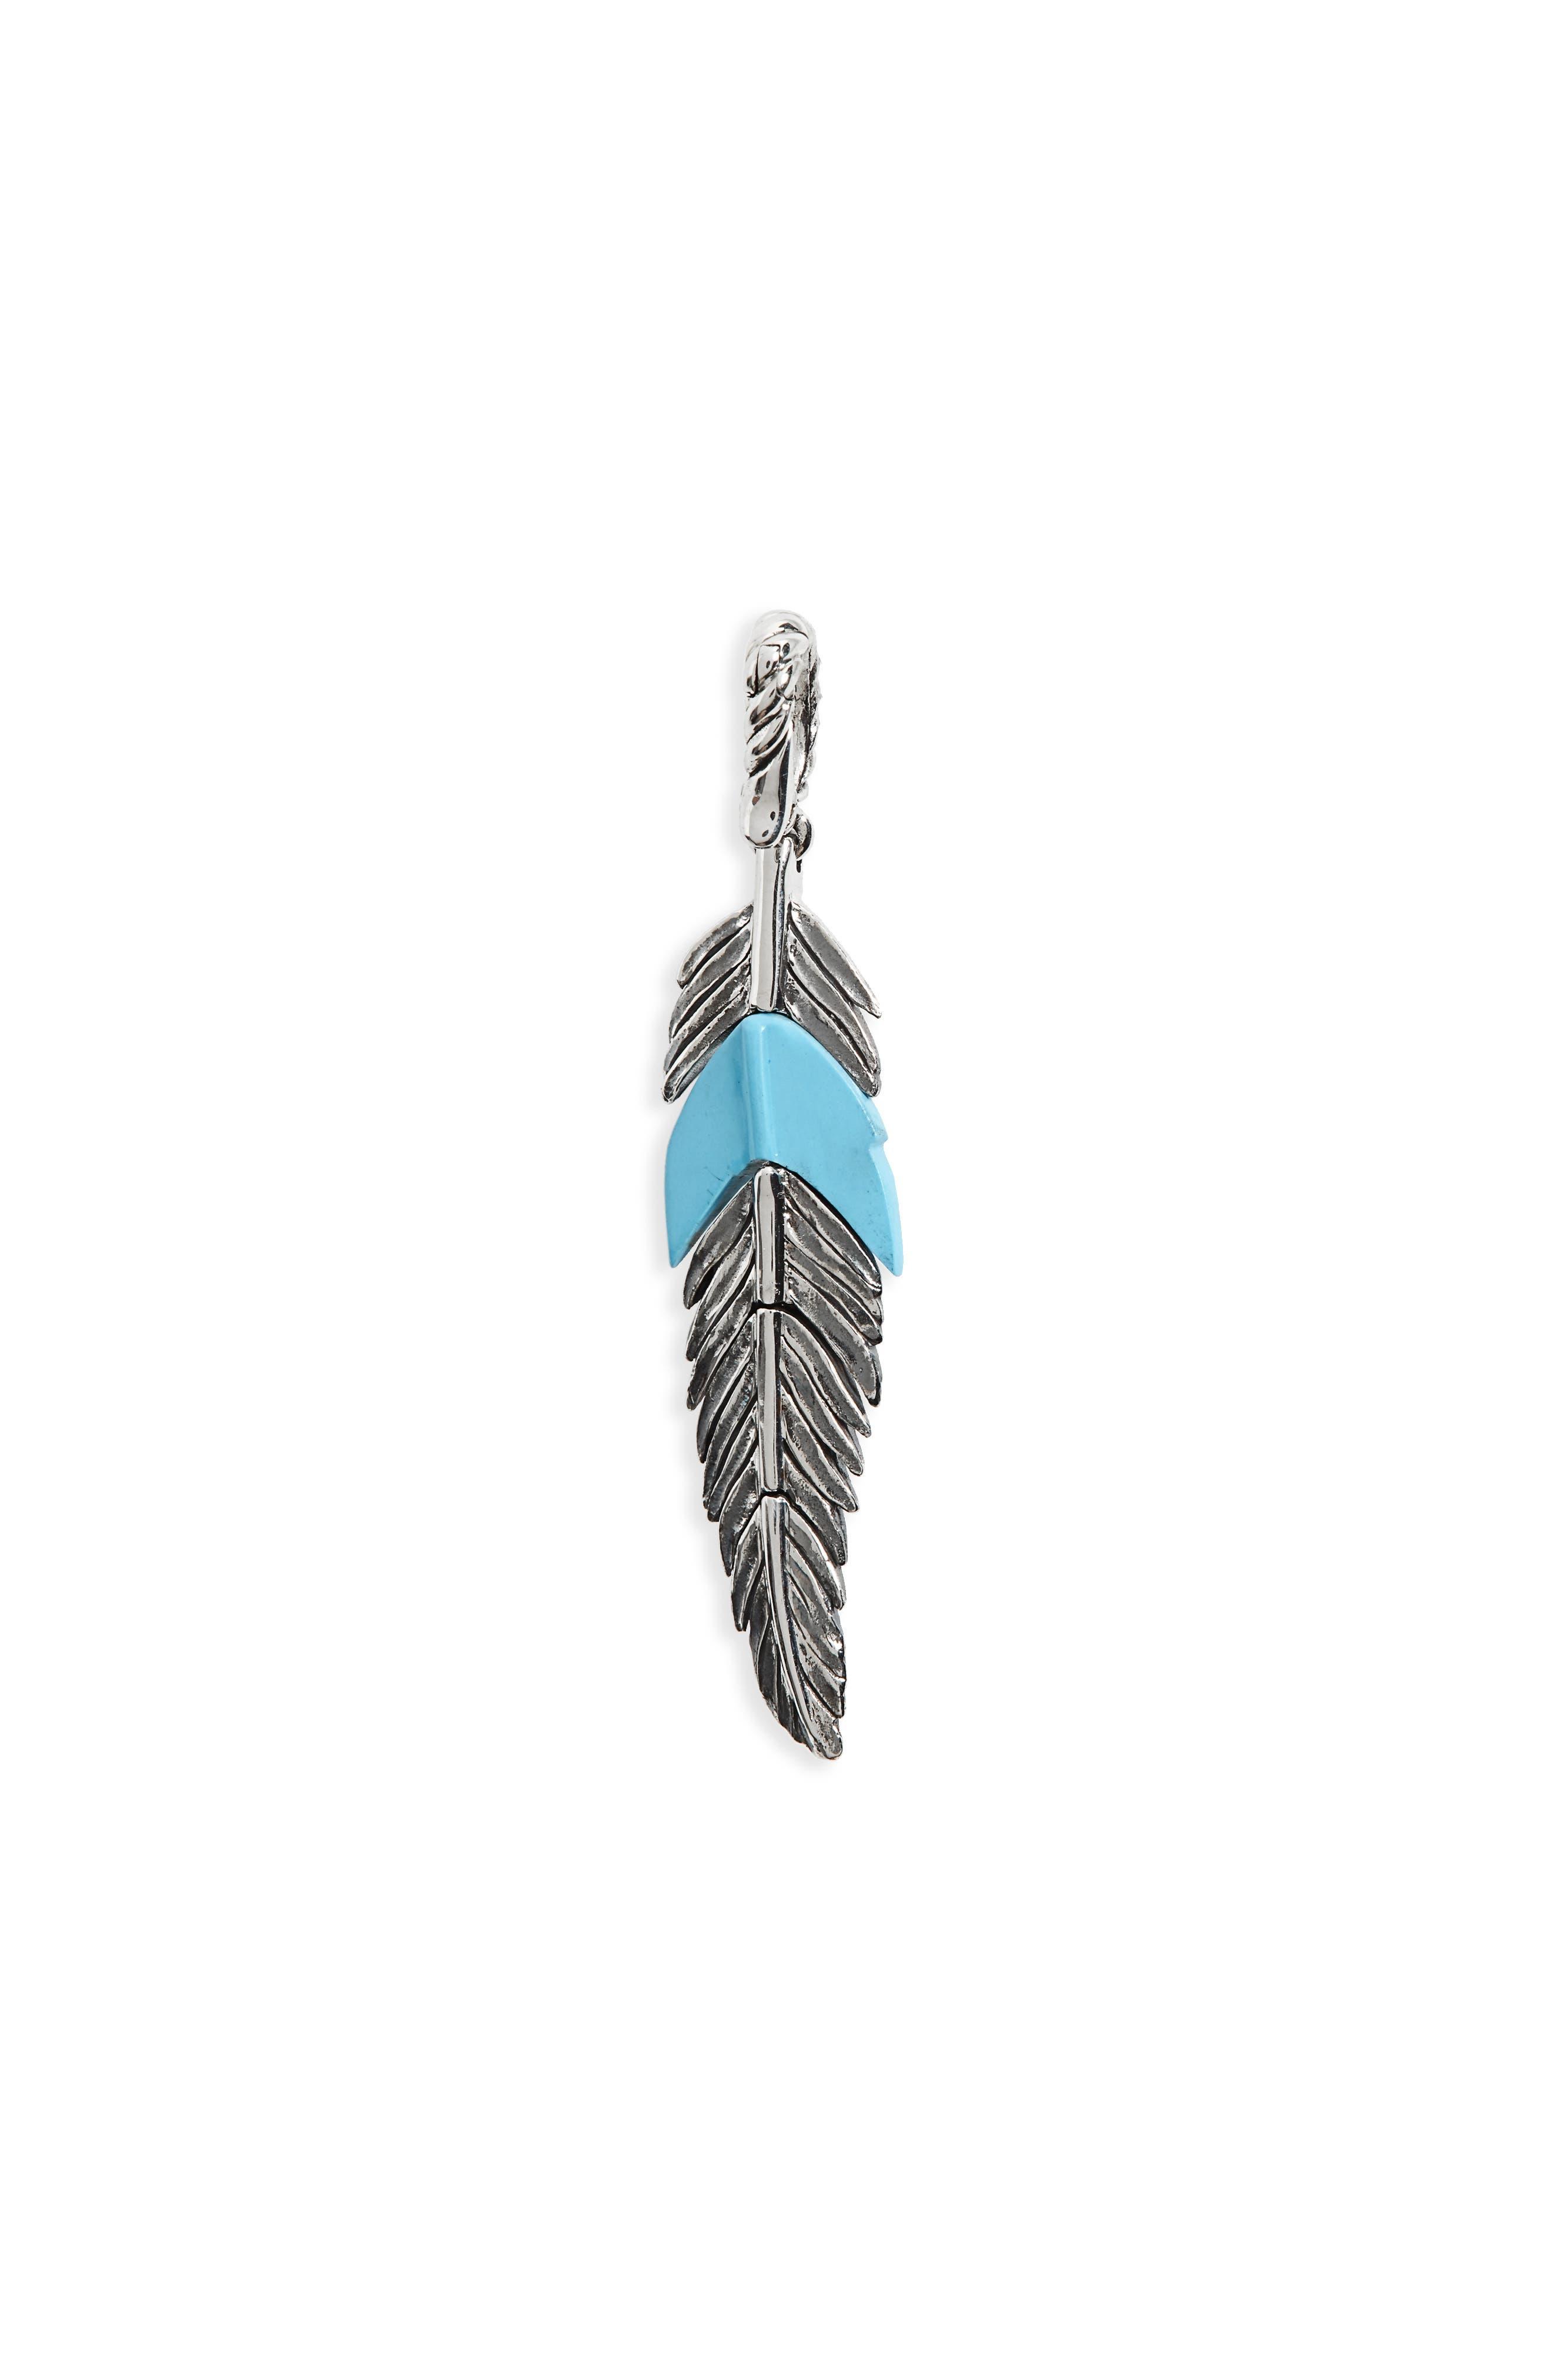 Main Image - David Yurman Feather Amulet with Turquoise